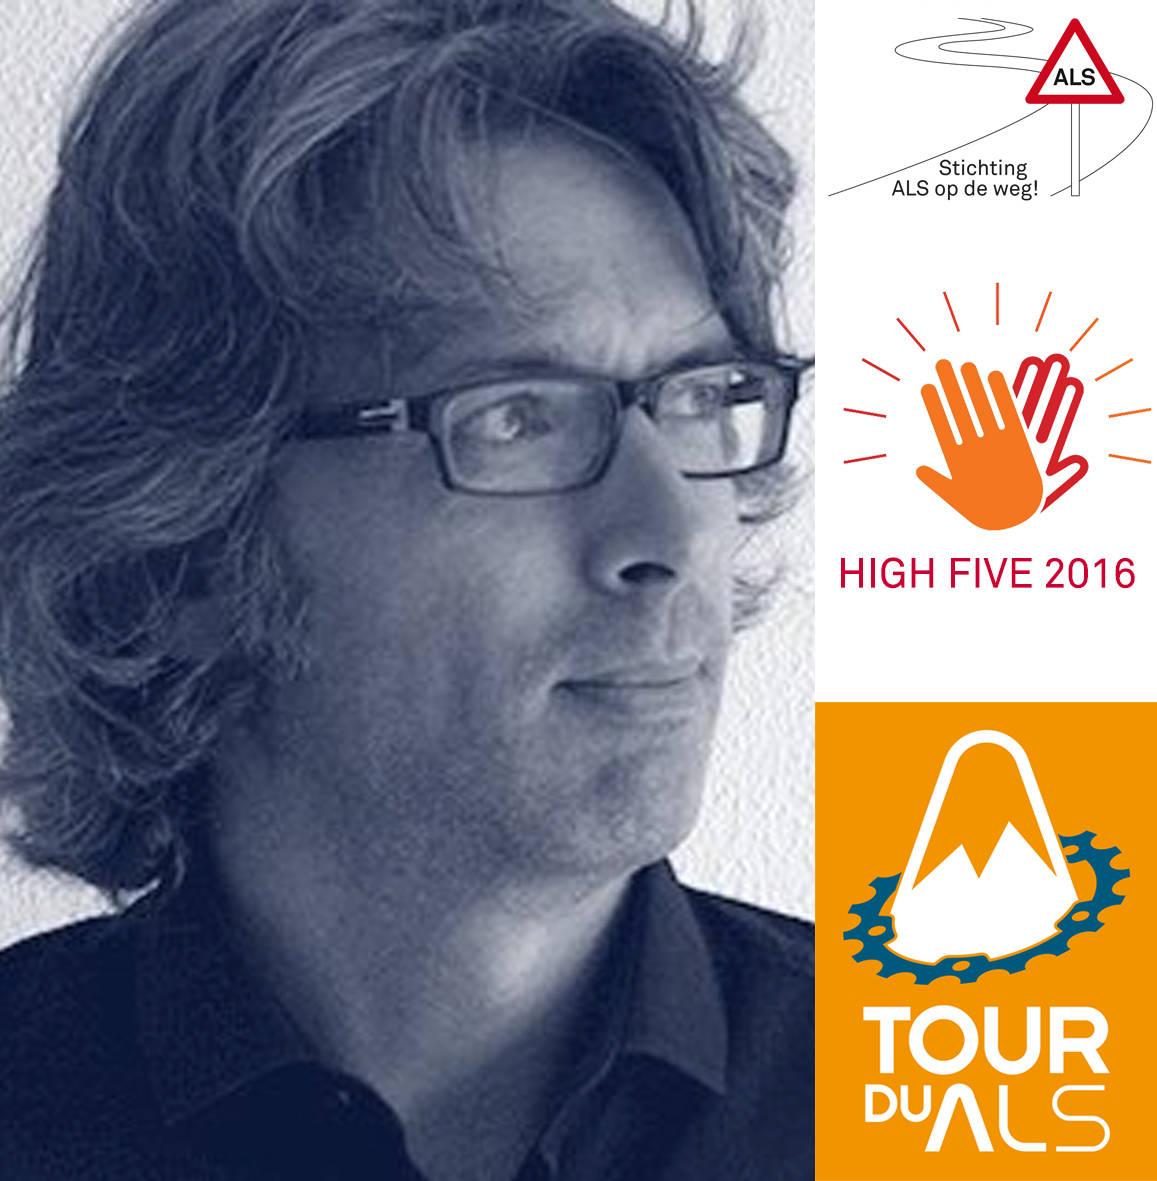 Stichting ALSopdeweg! - Jeroen, Tour du ALS 2016